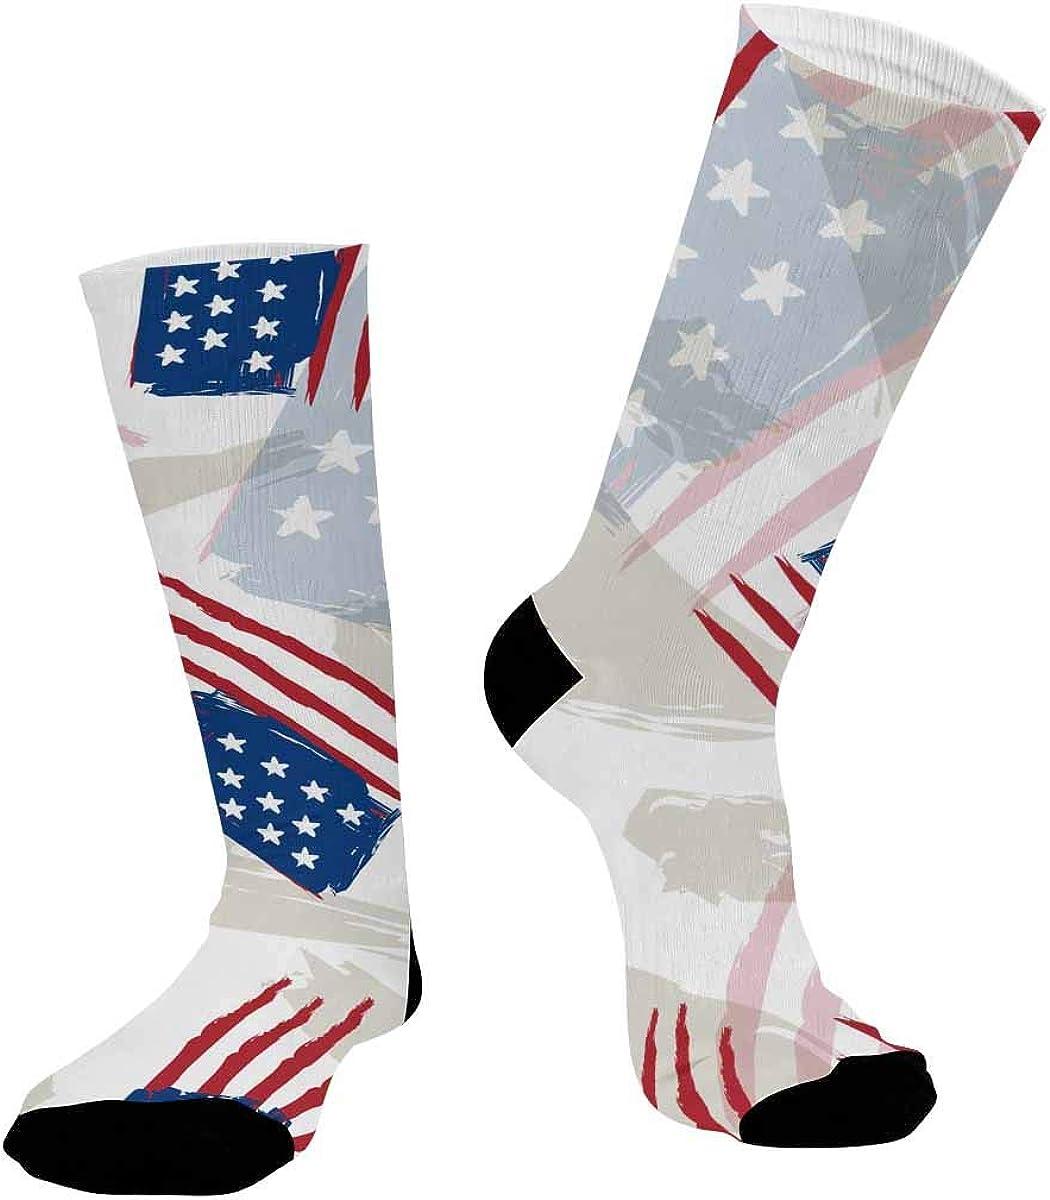 INTERESTPRINT Unisex Sublimated Athletic Crew Performance Socks USA Flags